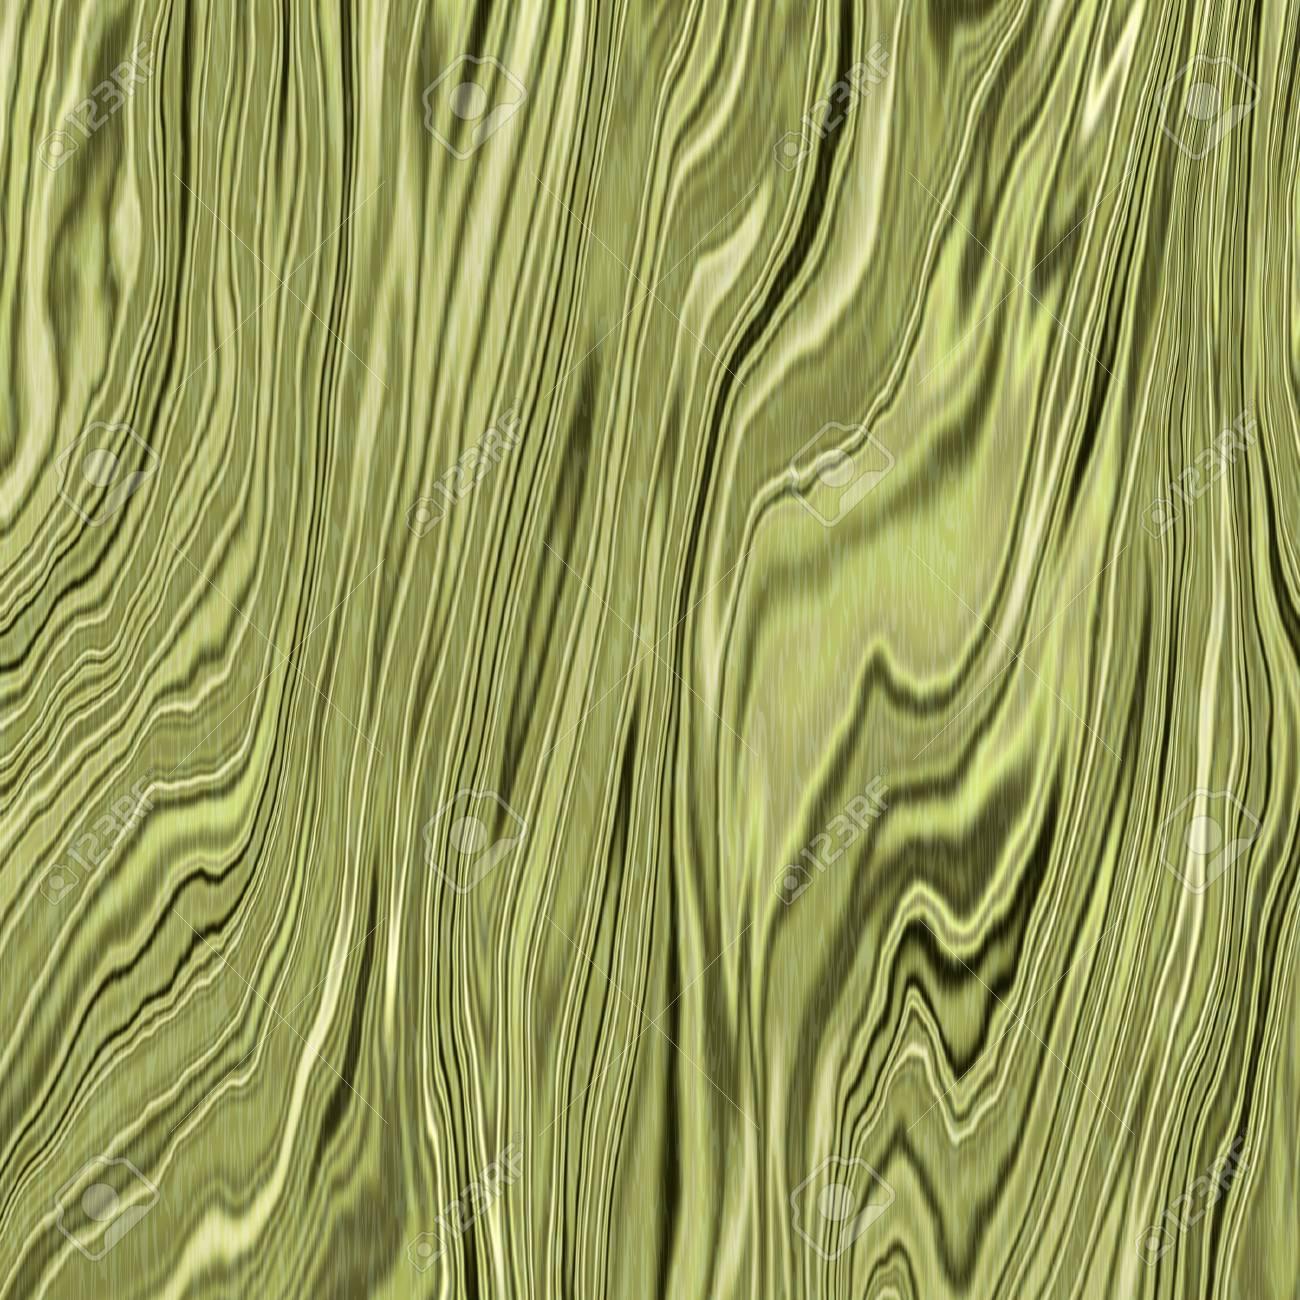 wood texture Stock Photo - 11253169